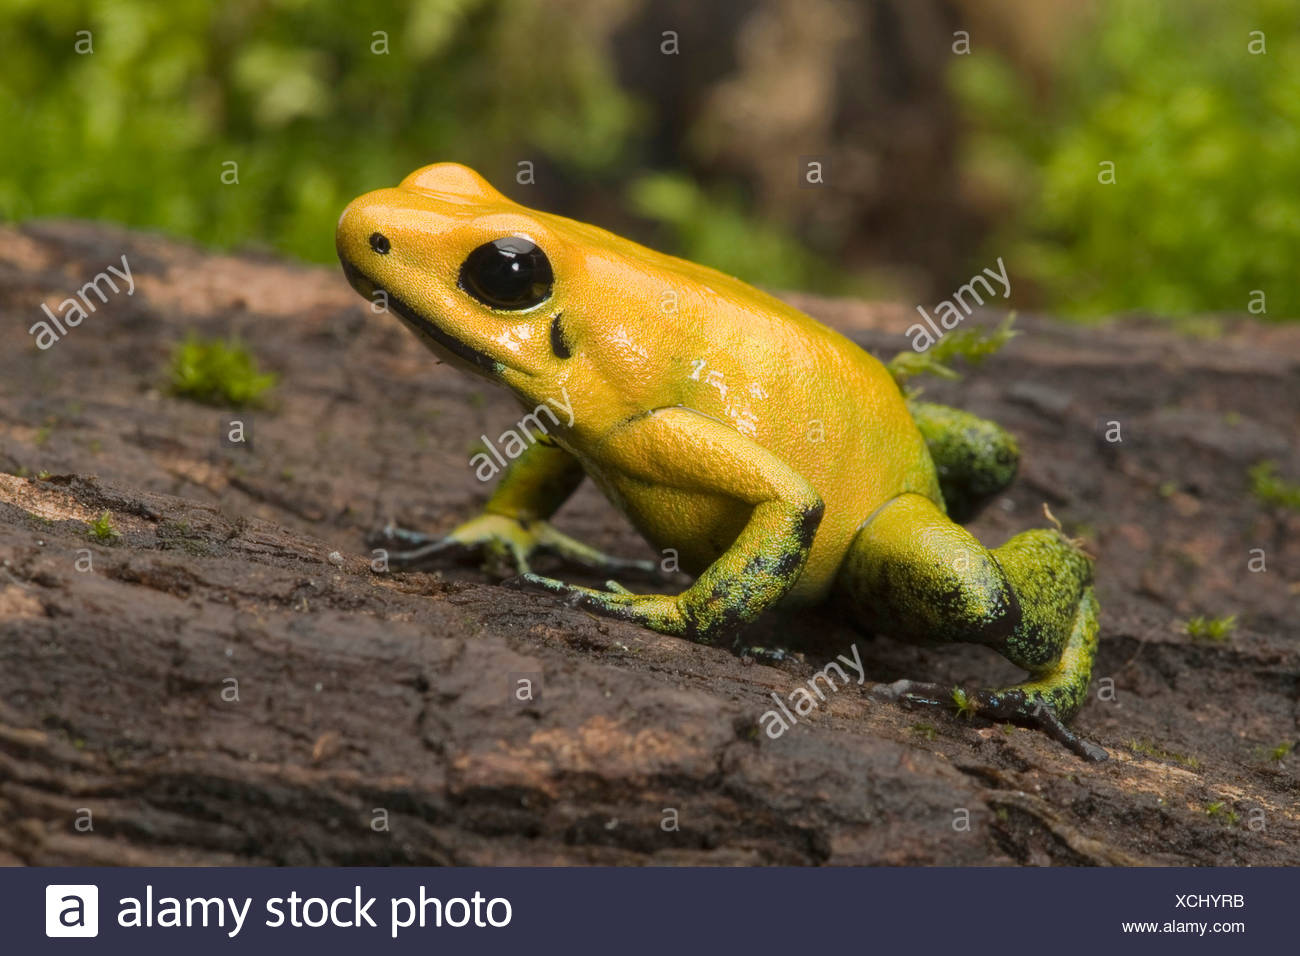 Black-Legged Poison Frog (Phyllobates bicolor), on bark Stock Photo